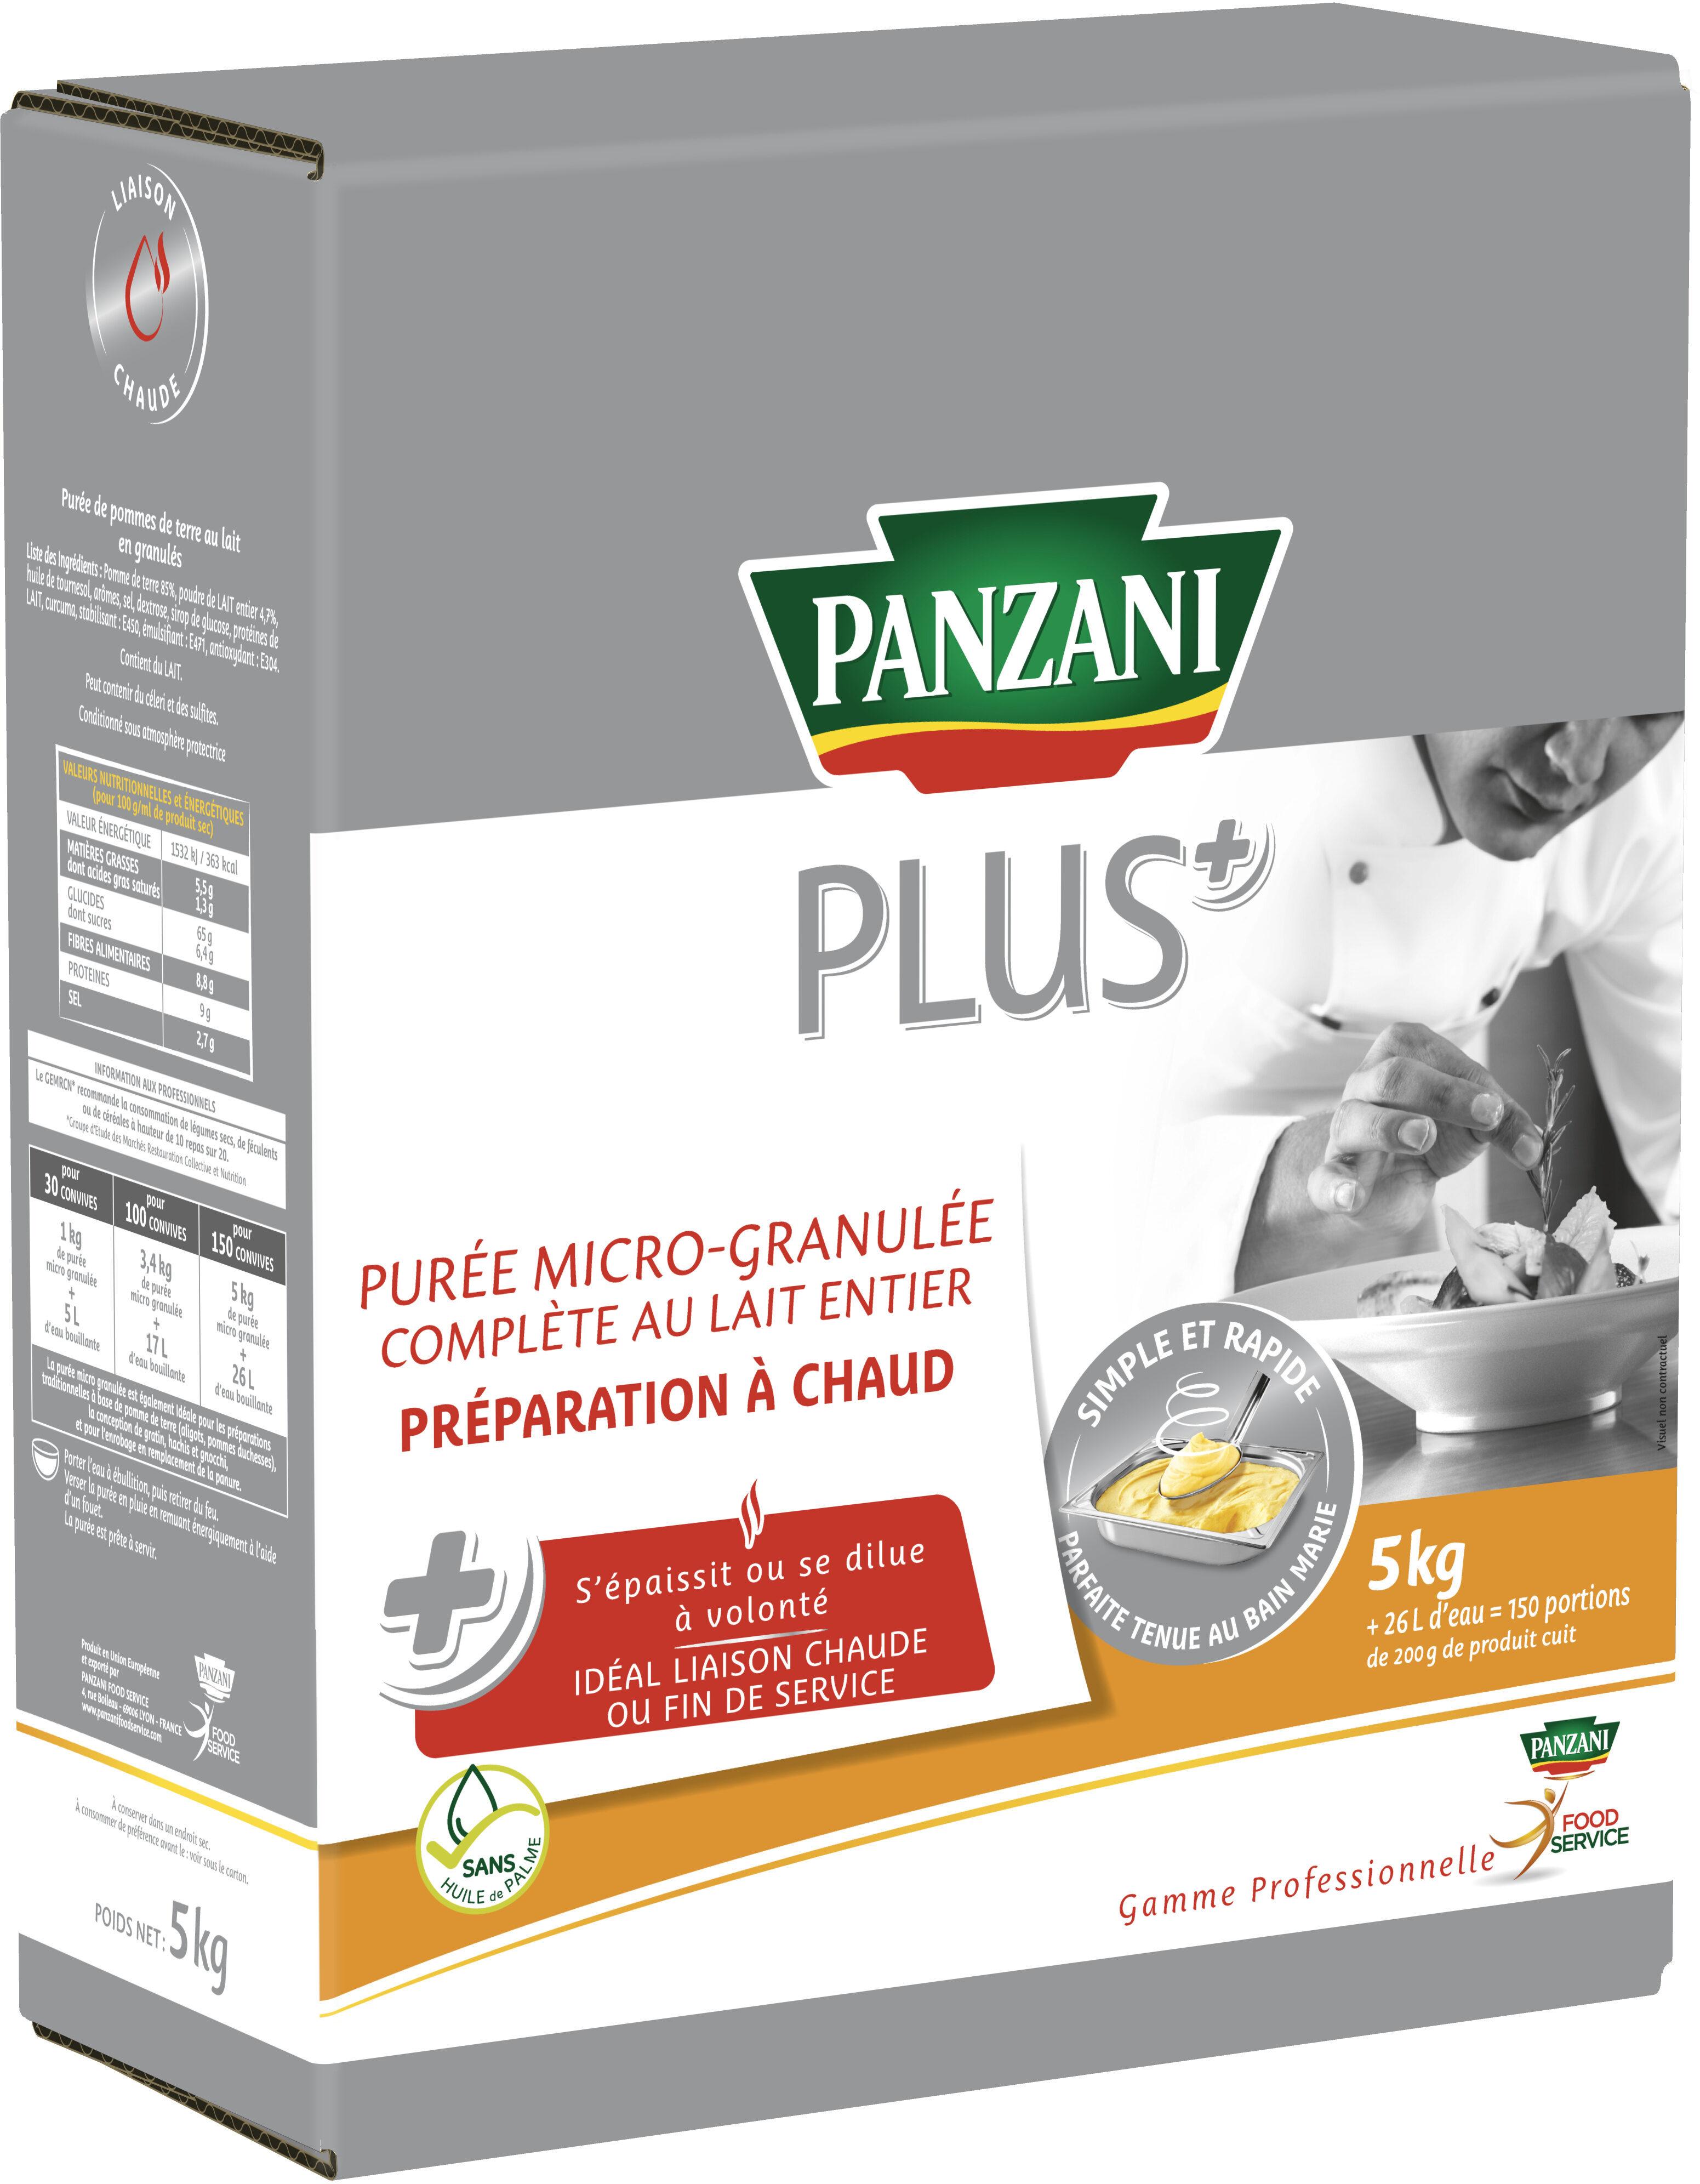 Panzani plus puree complete micro granulee rehydratable a chaud 5kg - Produit - fr